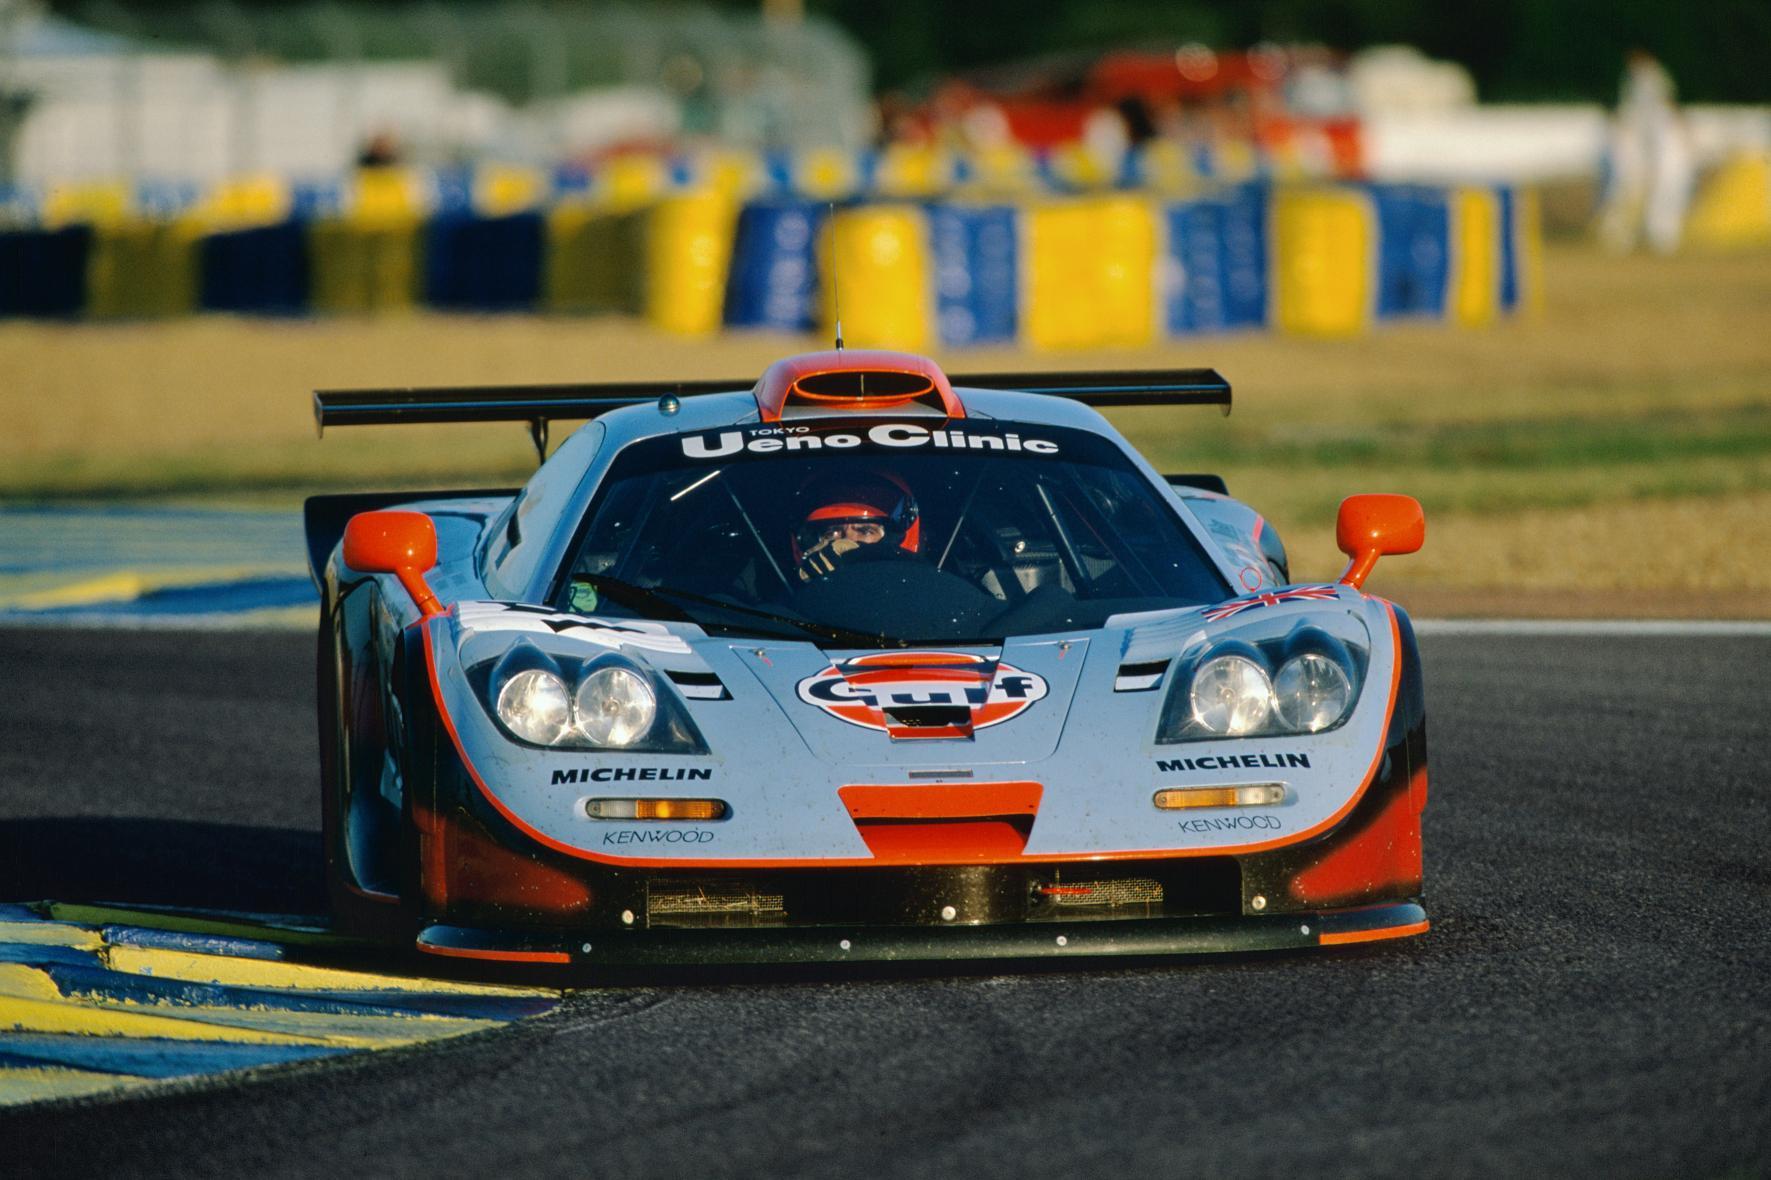 McLaren F1 GTR LM - 24 Heures du Mans 1997